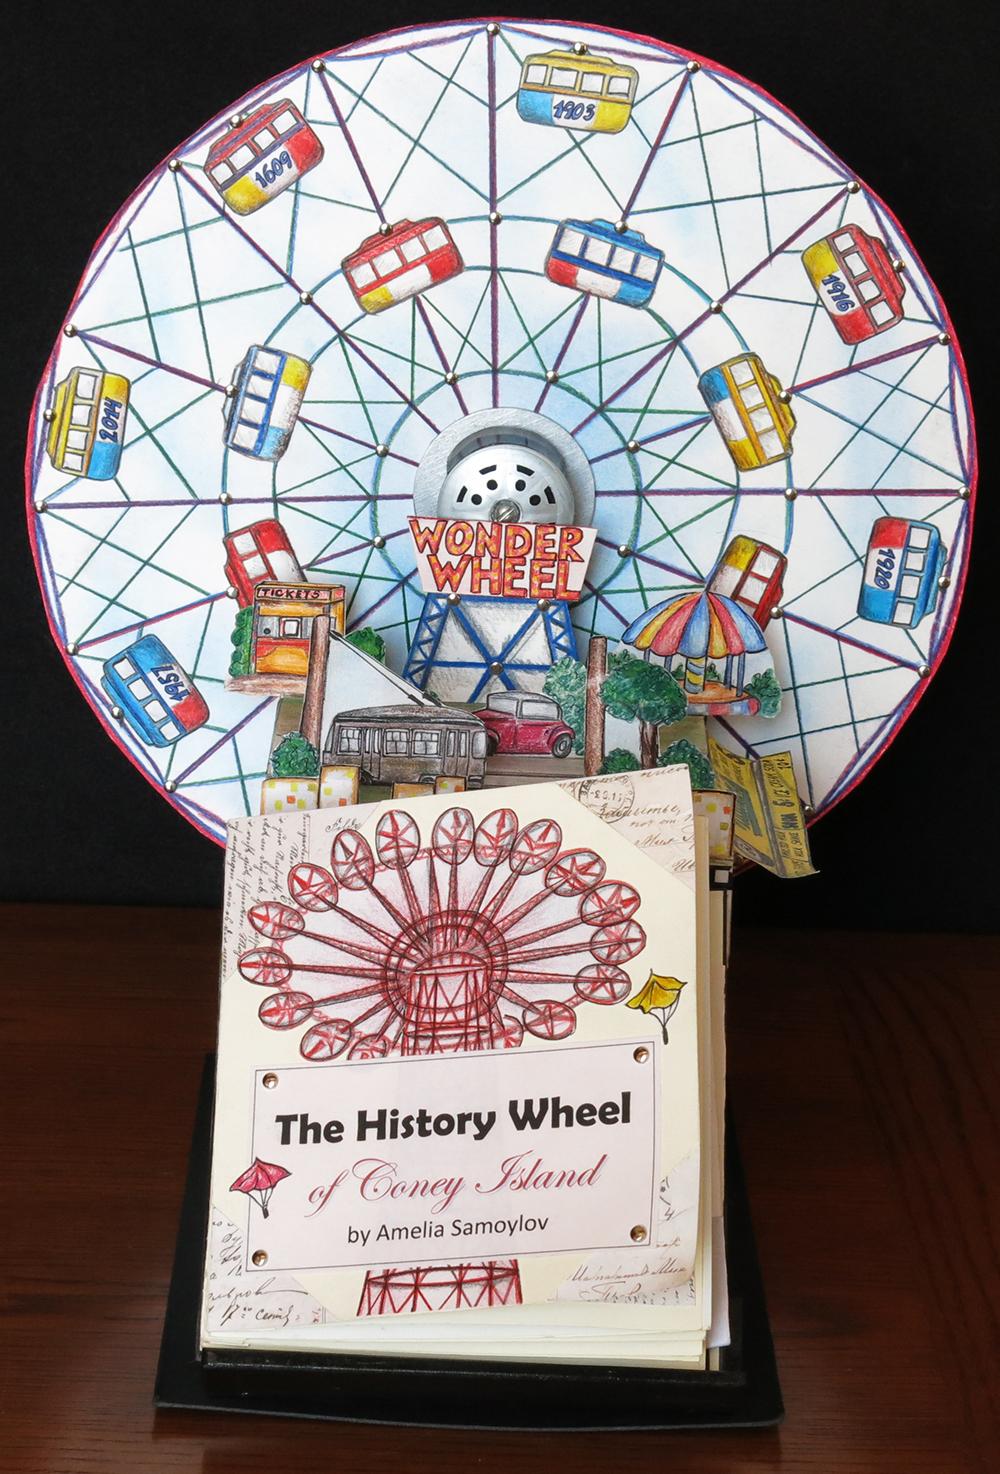 History Wheel Cover and Wheel-300dpi.jpg